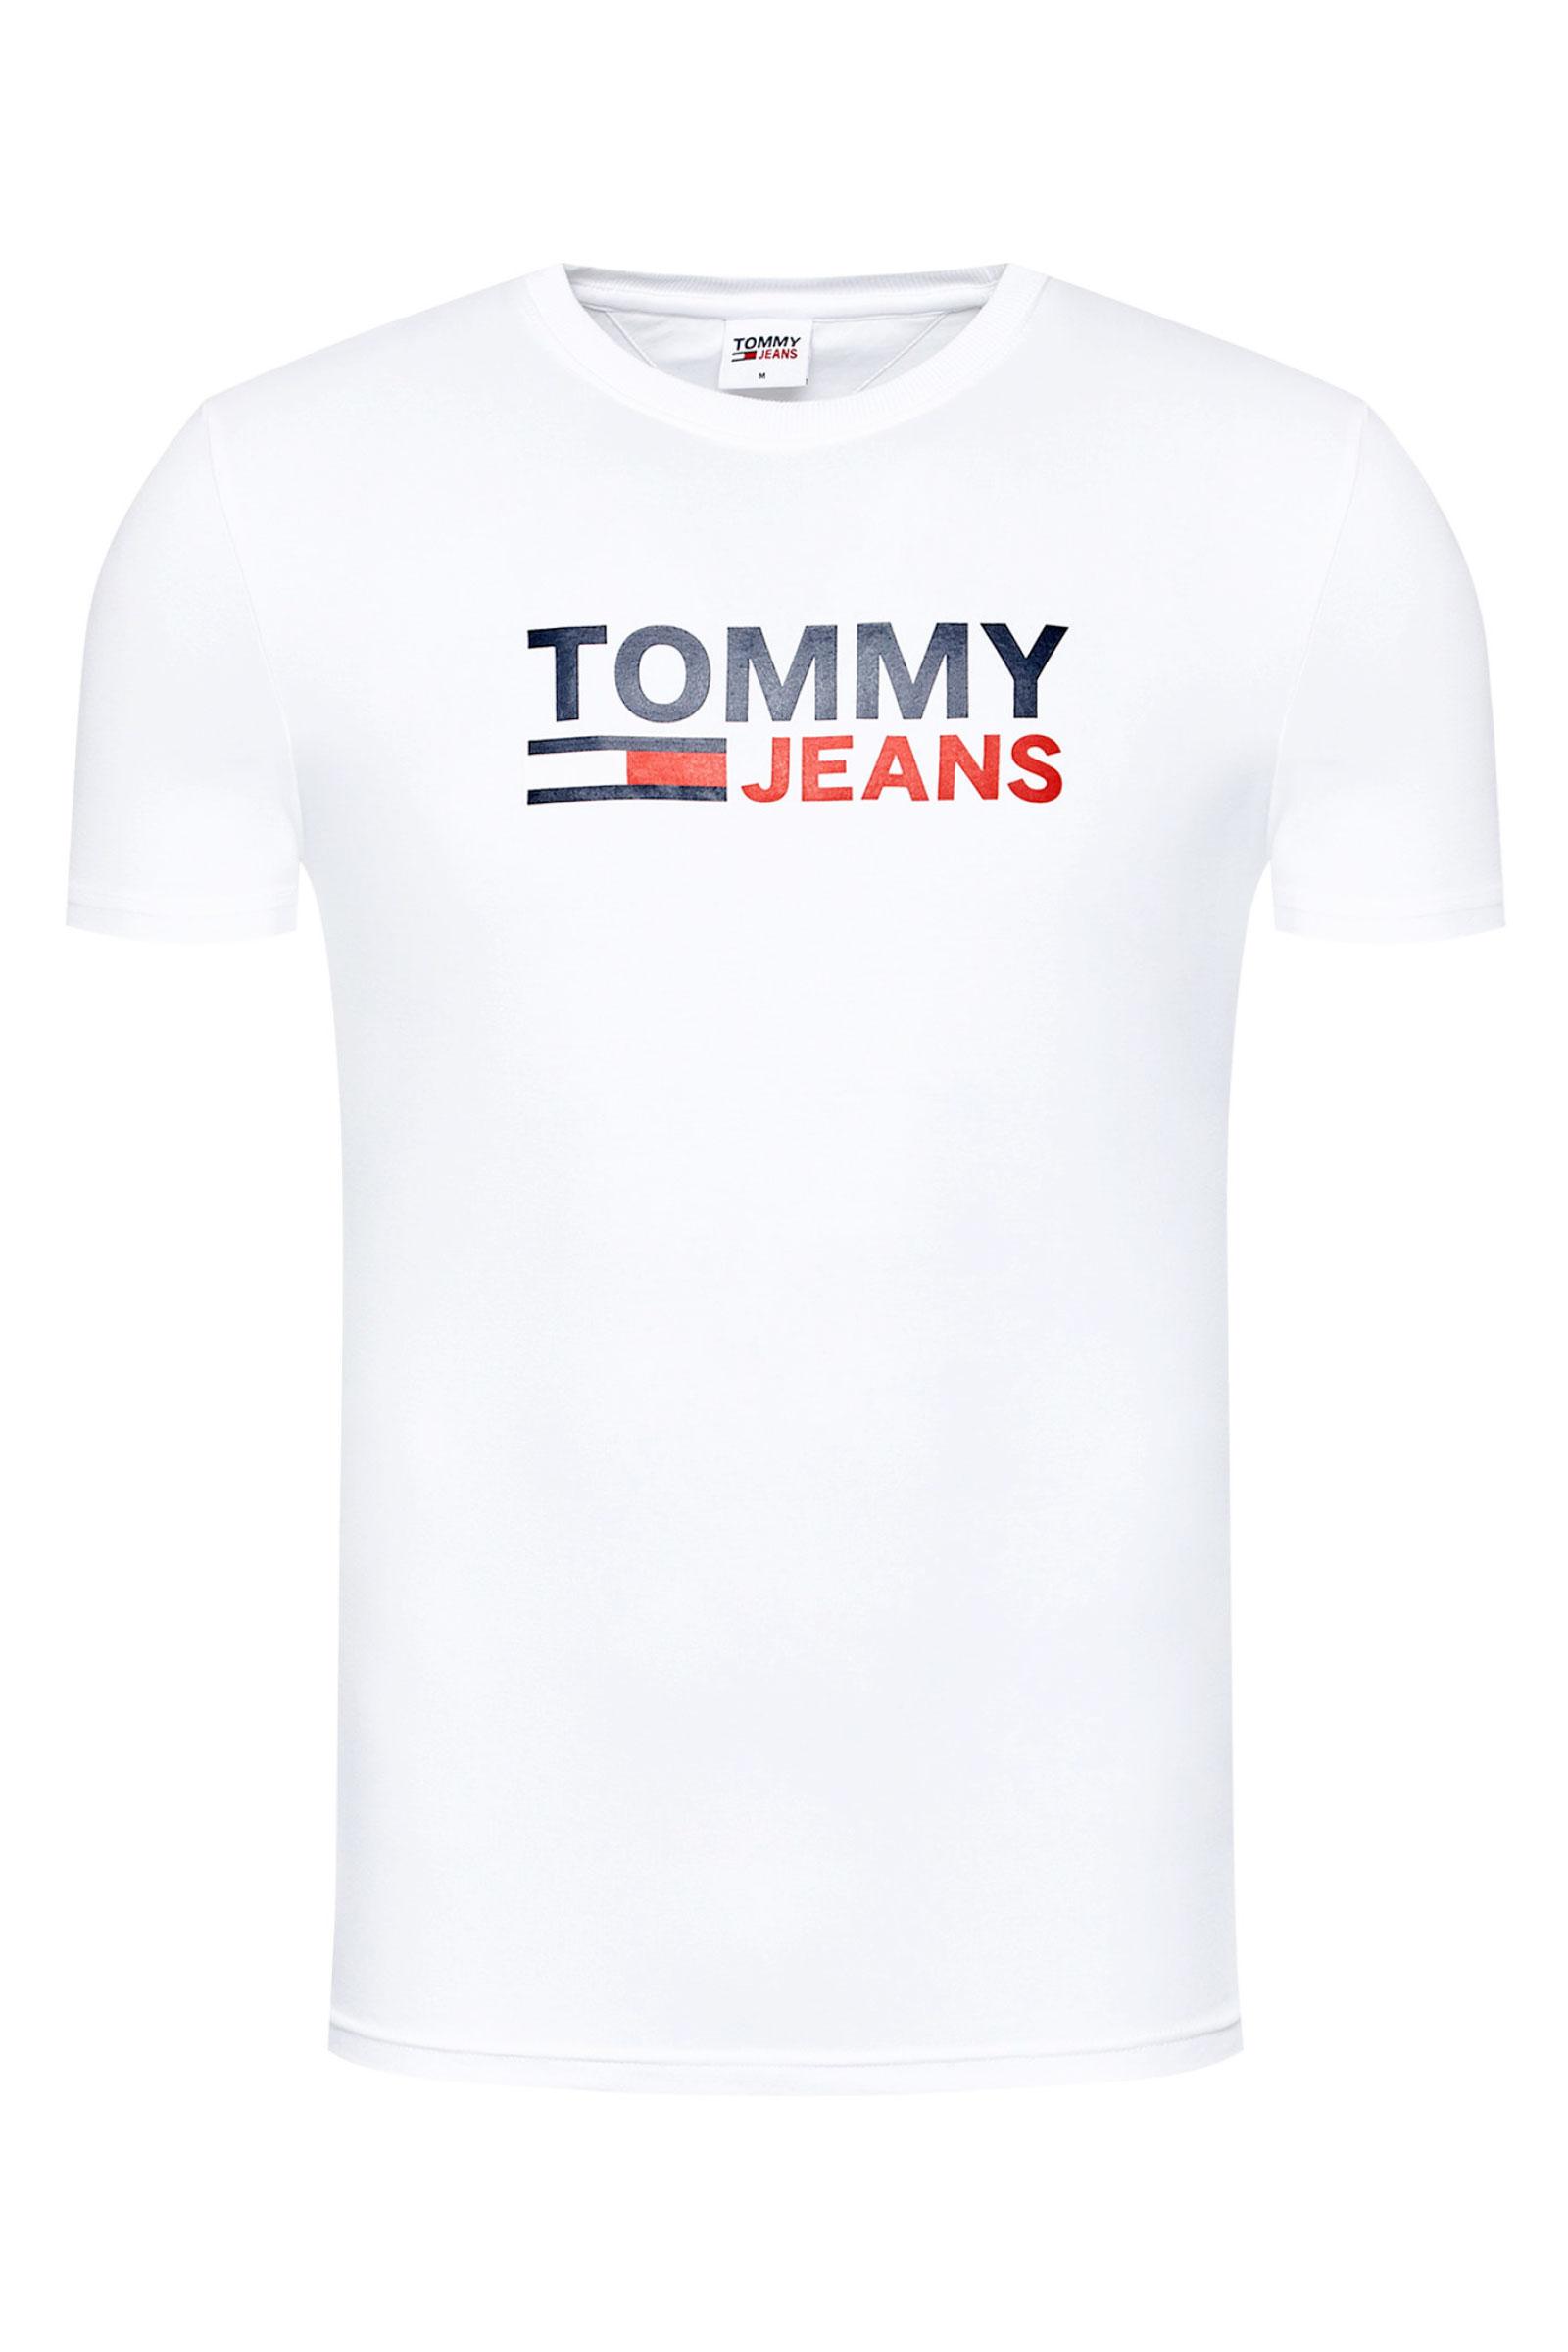 TOMMY JEANS T-Shirt Uomo TOMMY JEANS   T-Shirt   DM0DM10626YBR